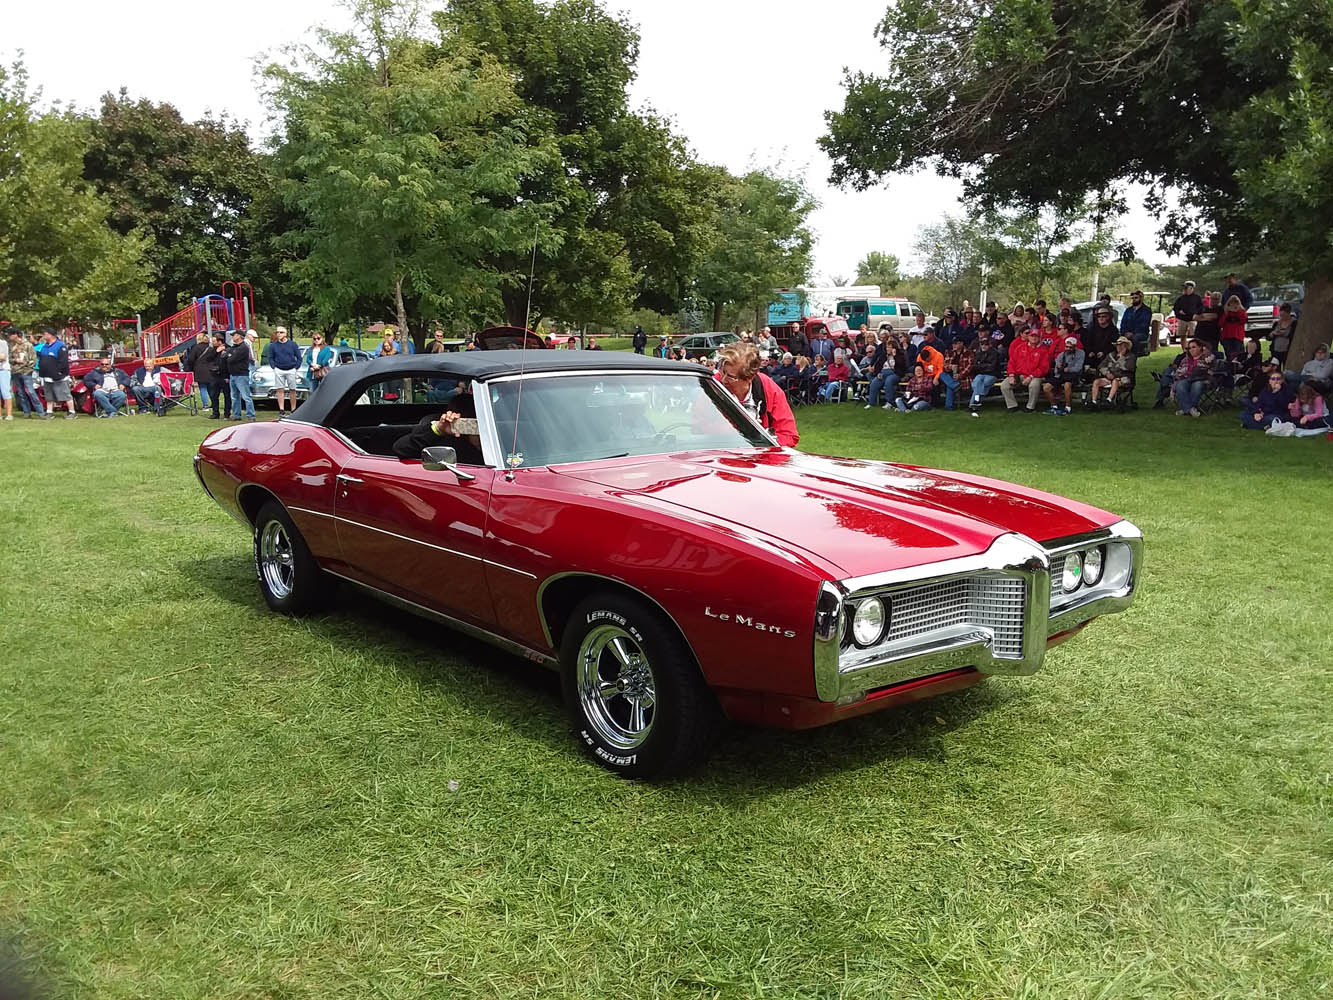 Specialty- 1969 Pontiac Lemans, Brian Wolff 1